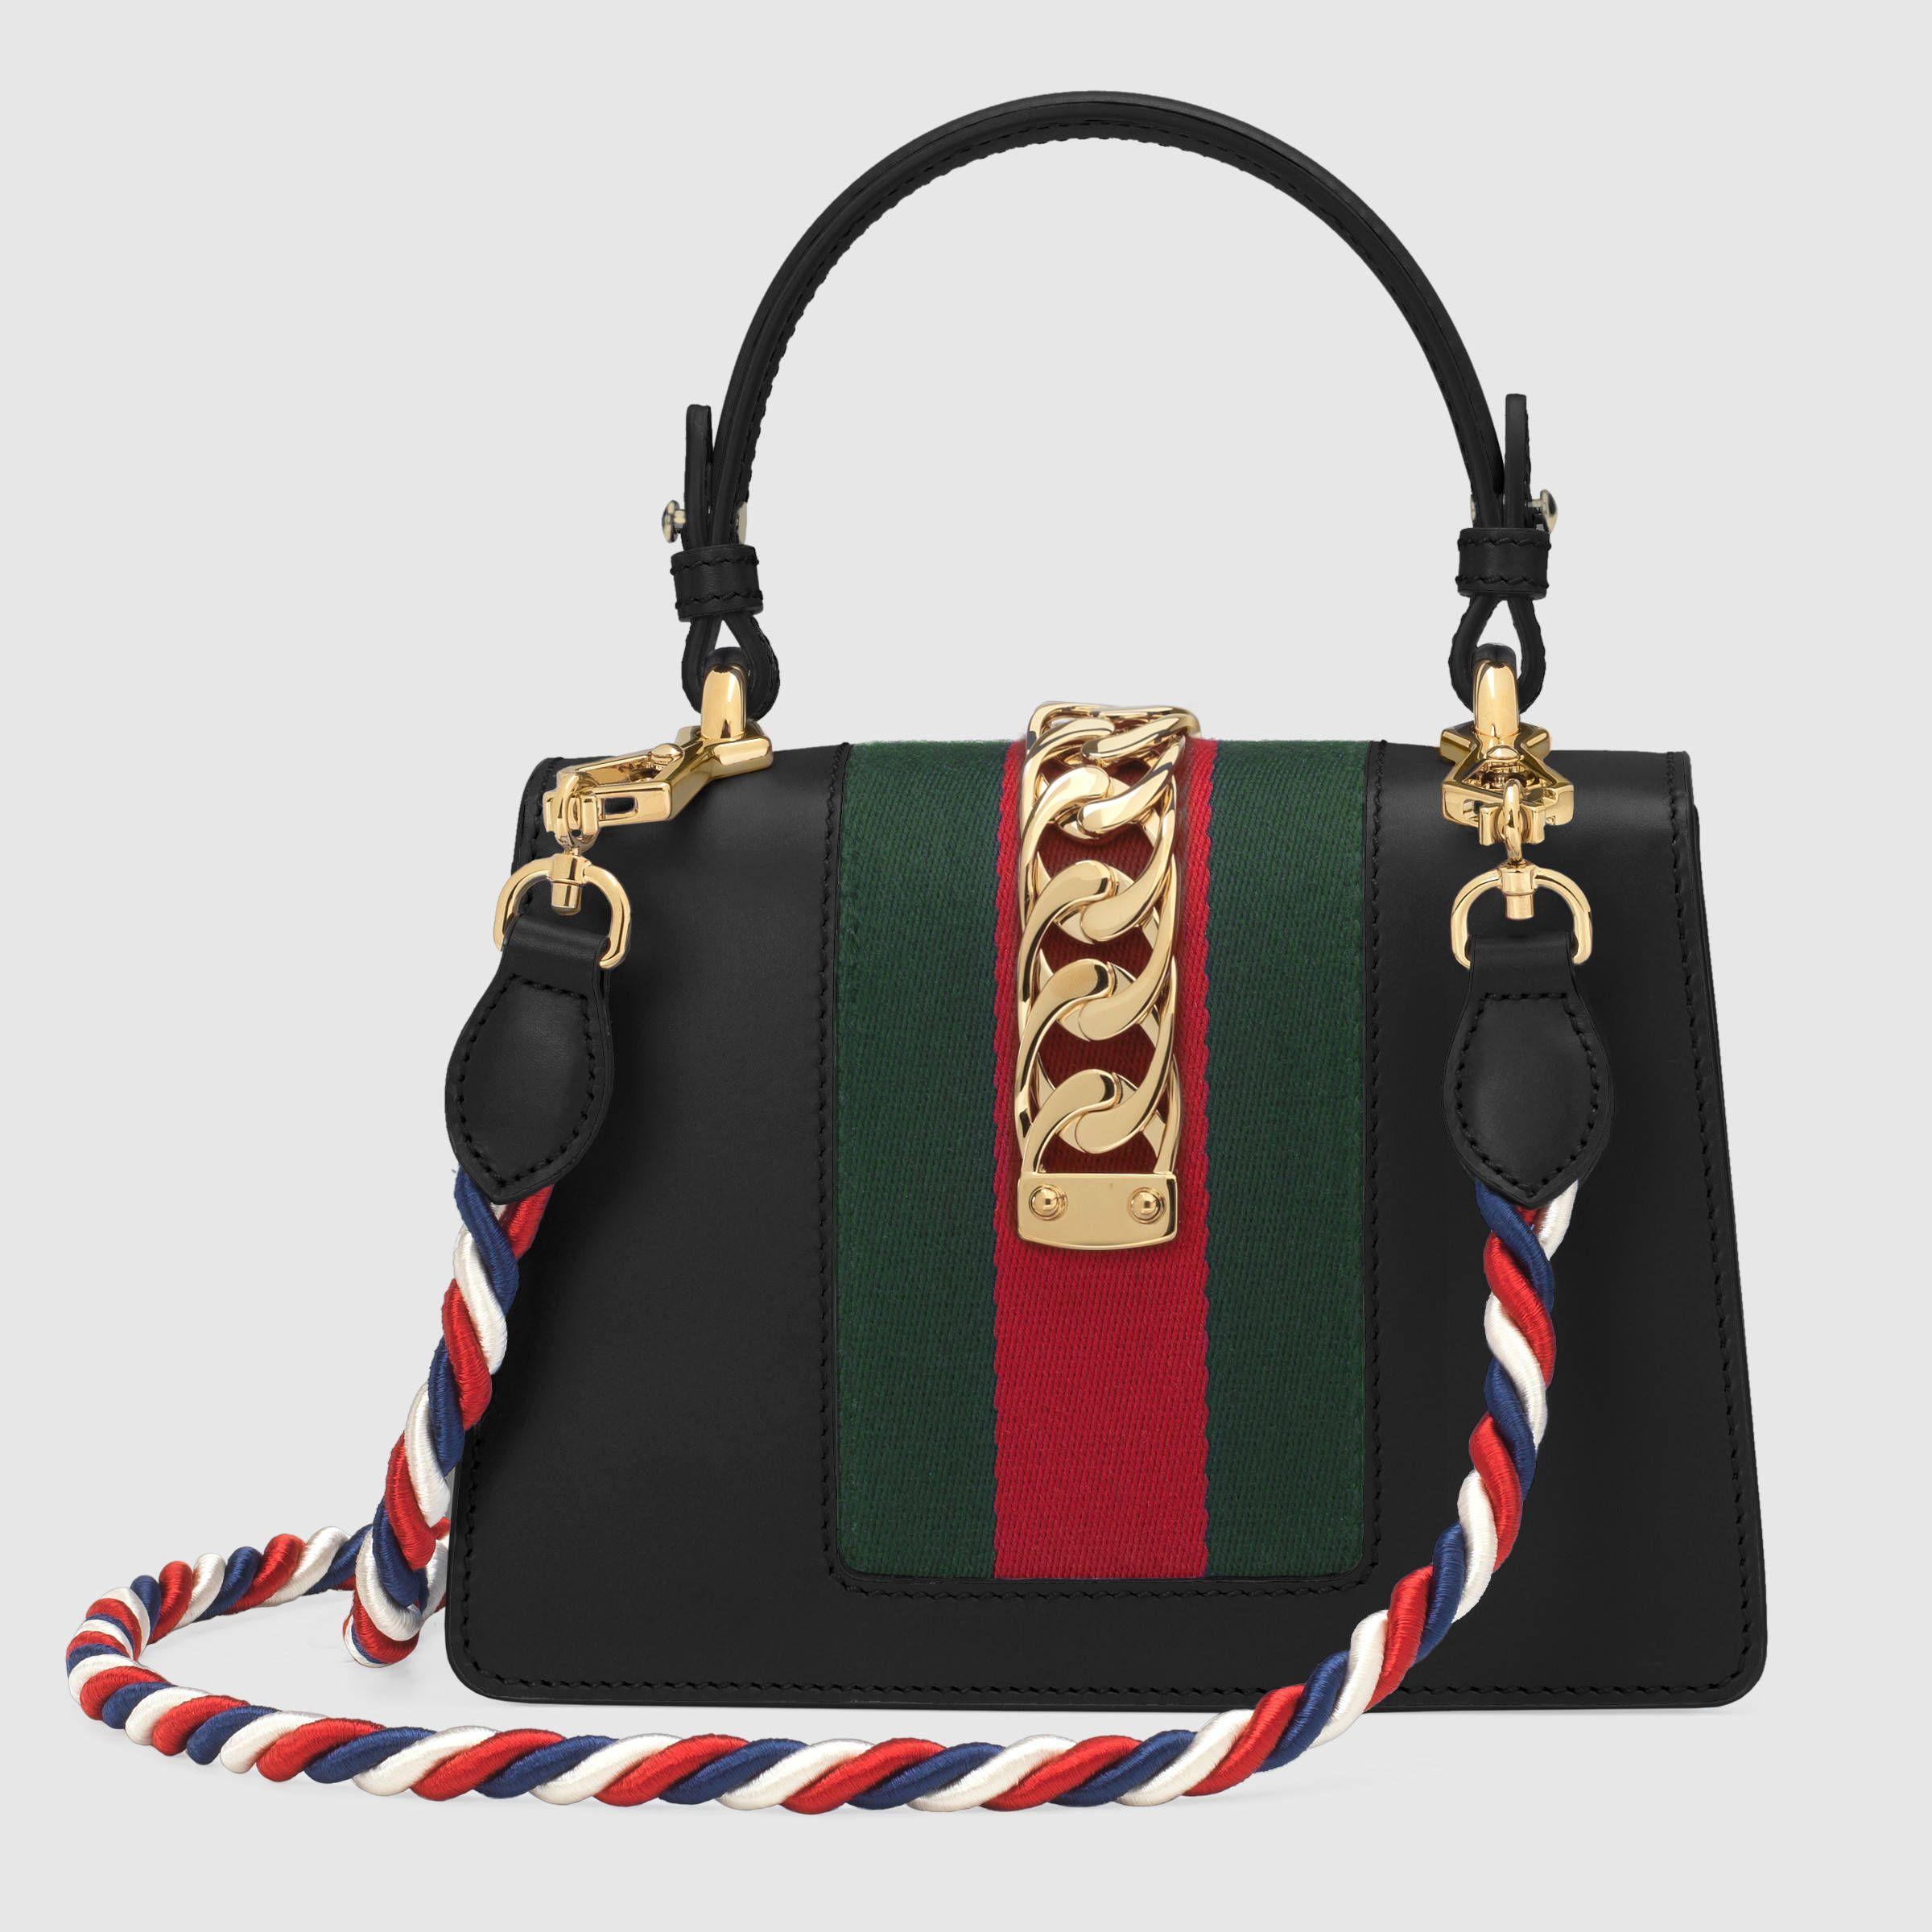 146df3beaa6c Gucci Mini Sylvie Velvet Top Handle Bag #Guccihandbags   Bags   Bags, Gucci  handbags, Mini Bag